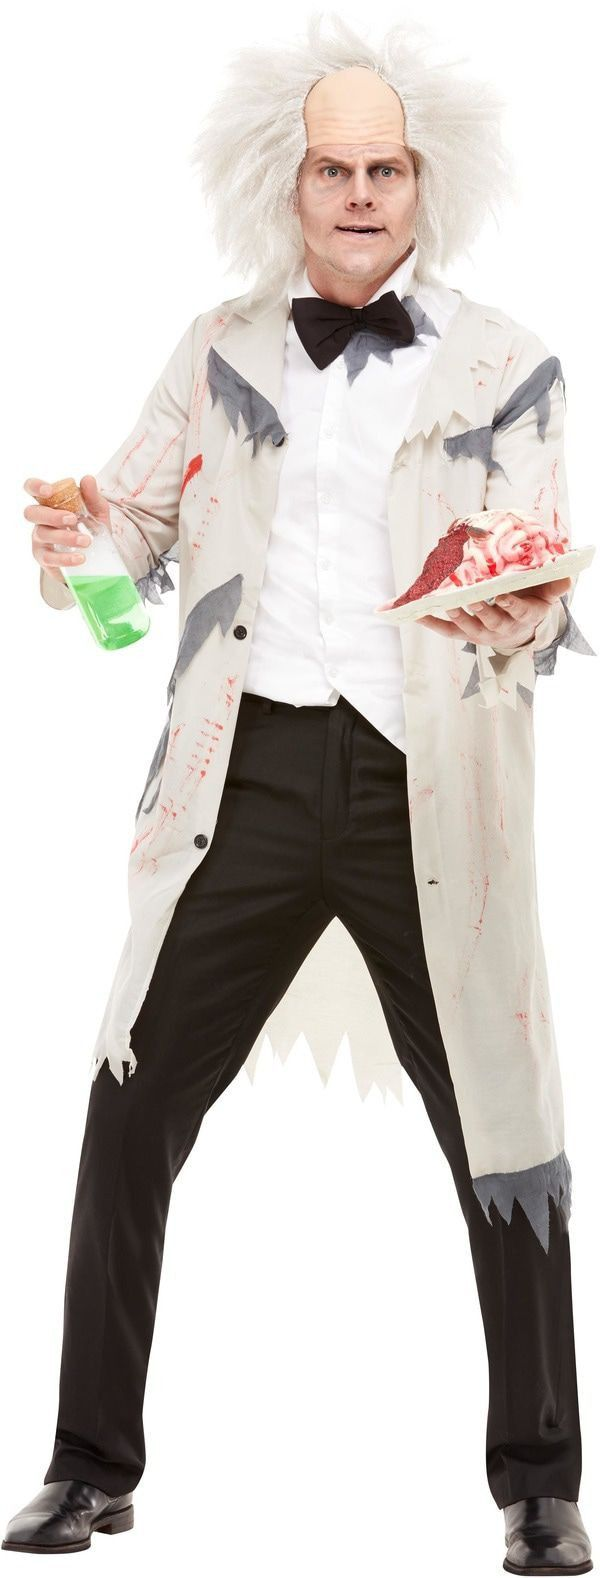 Knotsgekke Professor Laboratorium Man Kostuum